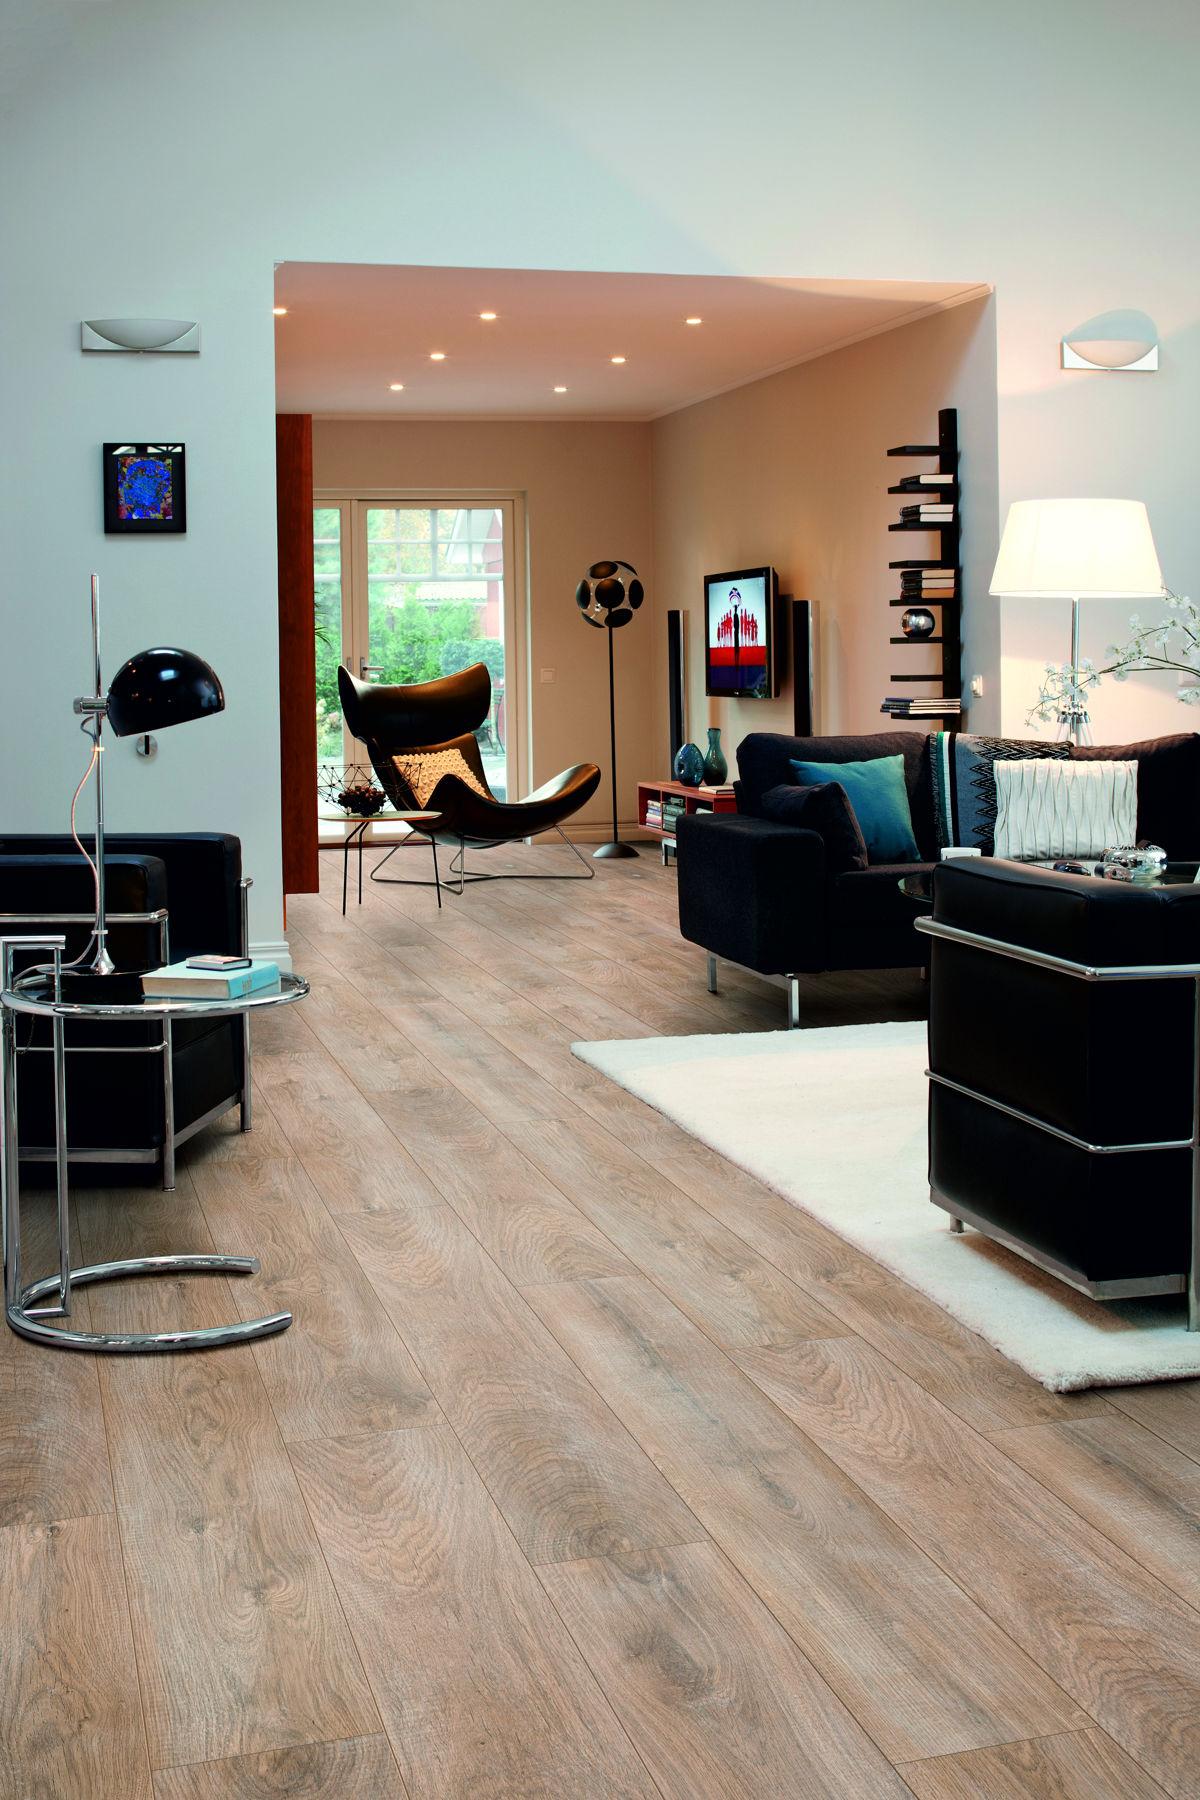 Pergo Laminate Flooring step 17 Pergo Living Expression Chalked Blonde Oak Laminate Flooring